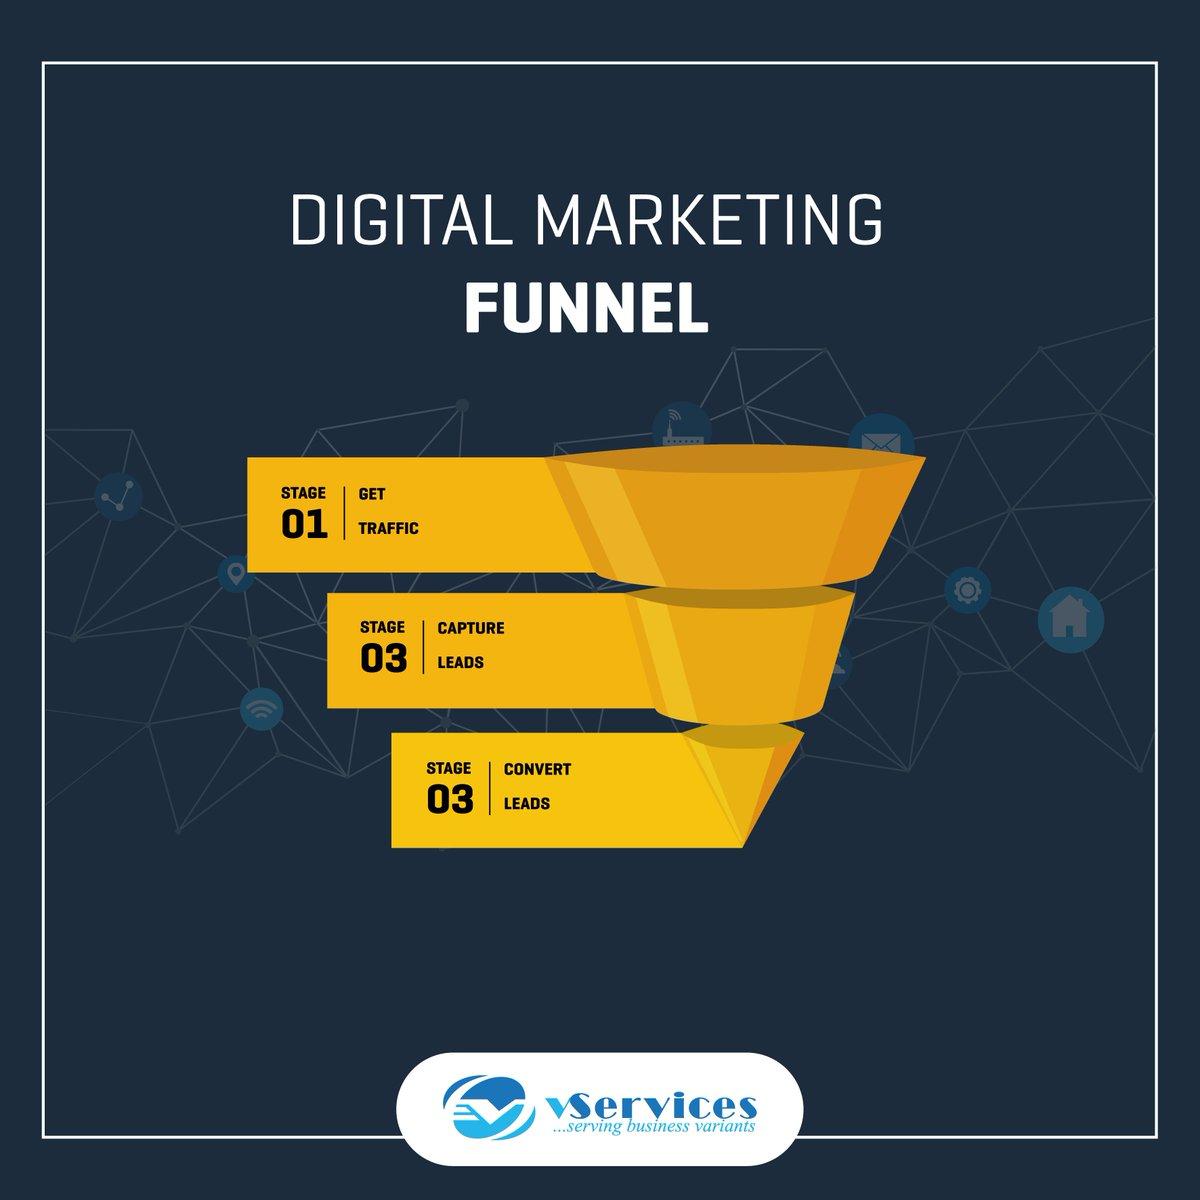 #DigitalMarketing Funnel #SEO #makeyourownlane #startup #GrowthHacking #defstar5  #SMM #socialmedia #BigData  http://www. vservices.com  &nbsp;  <br>http://pic.twitter.com/4hidGN7unc